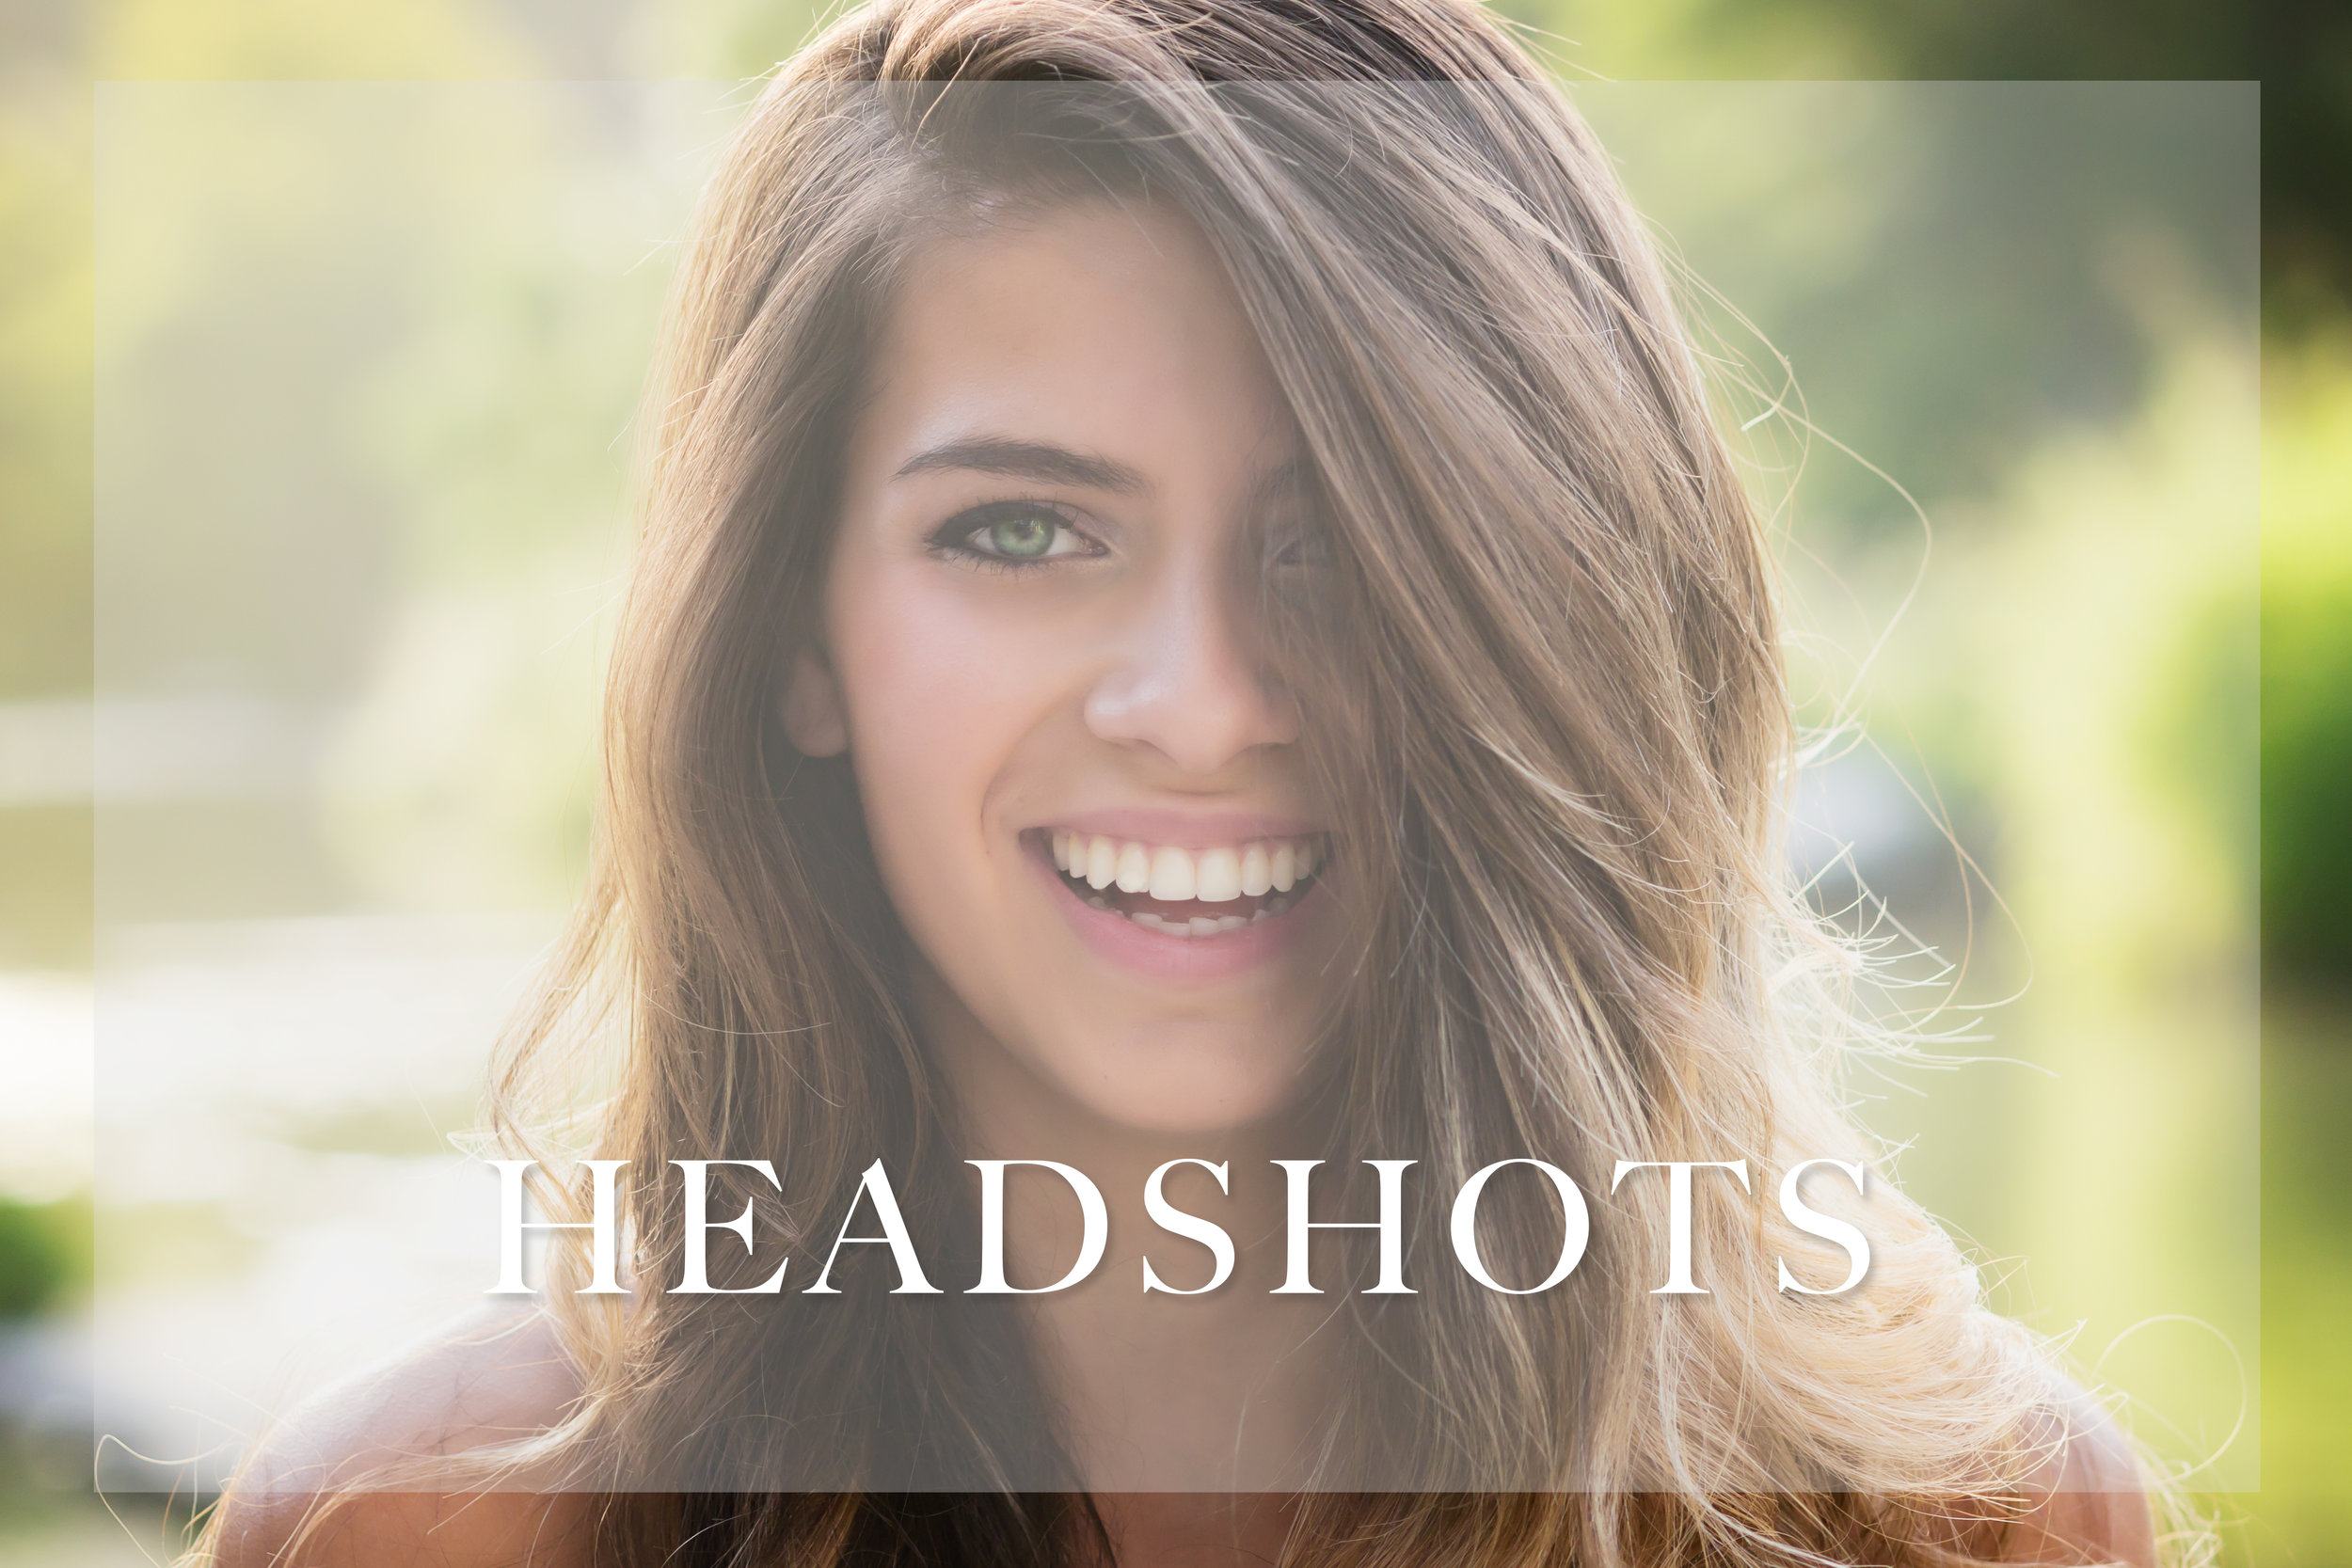 Headshot-Button.jpg